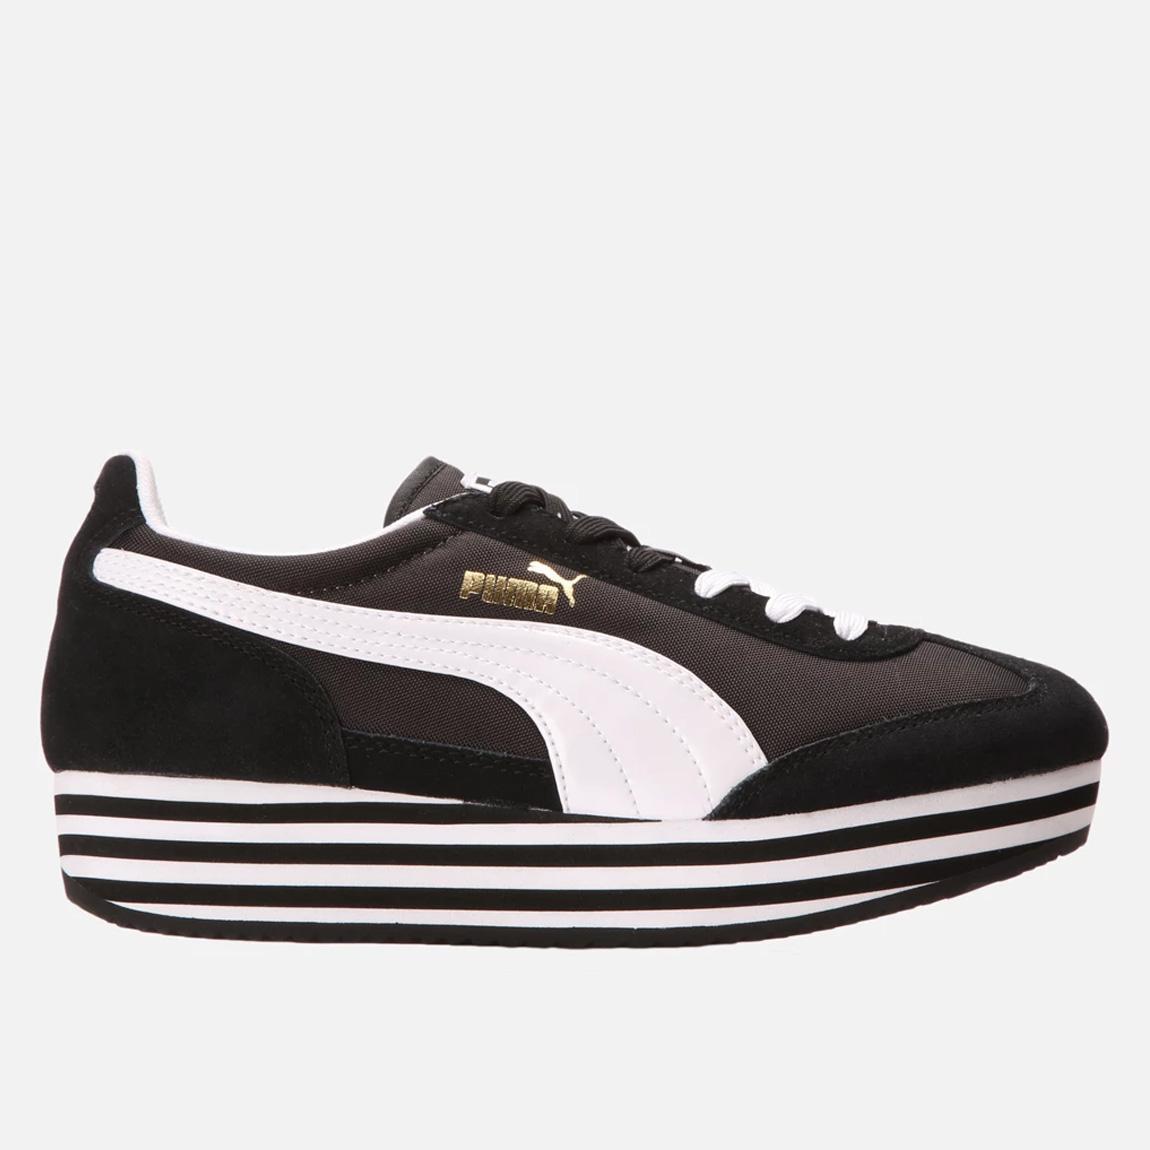 puma sf77 platform black and white puma sneakers. Black Bedroom Furniture Sets. Home Design Ideas